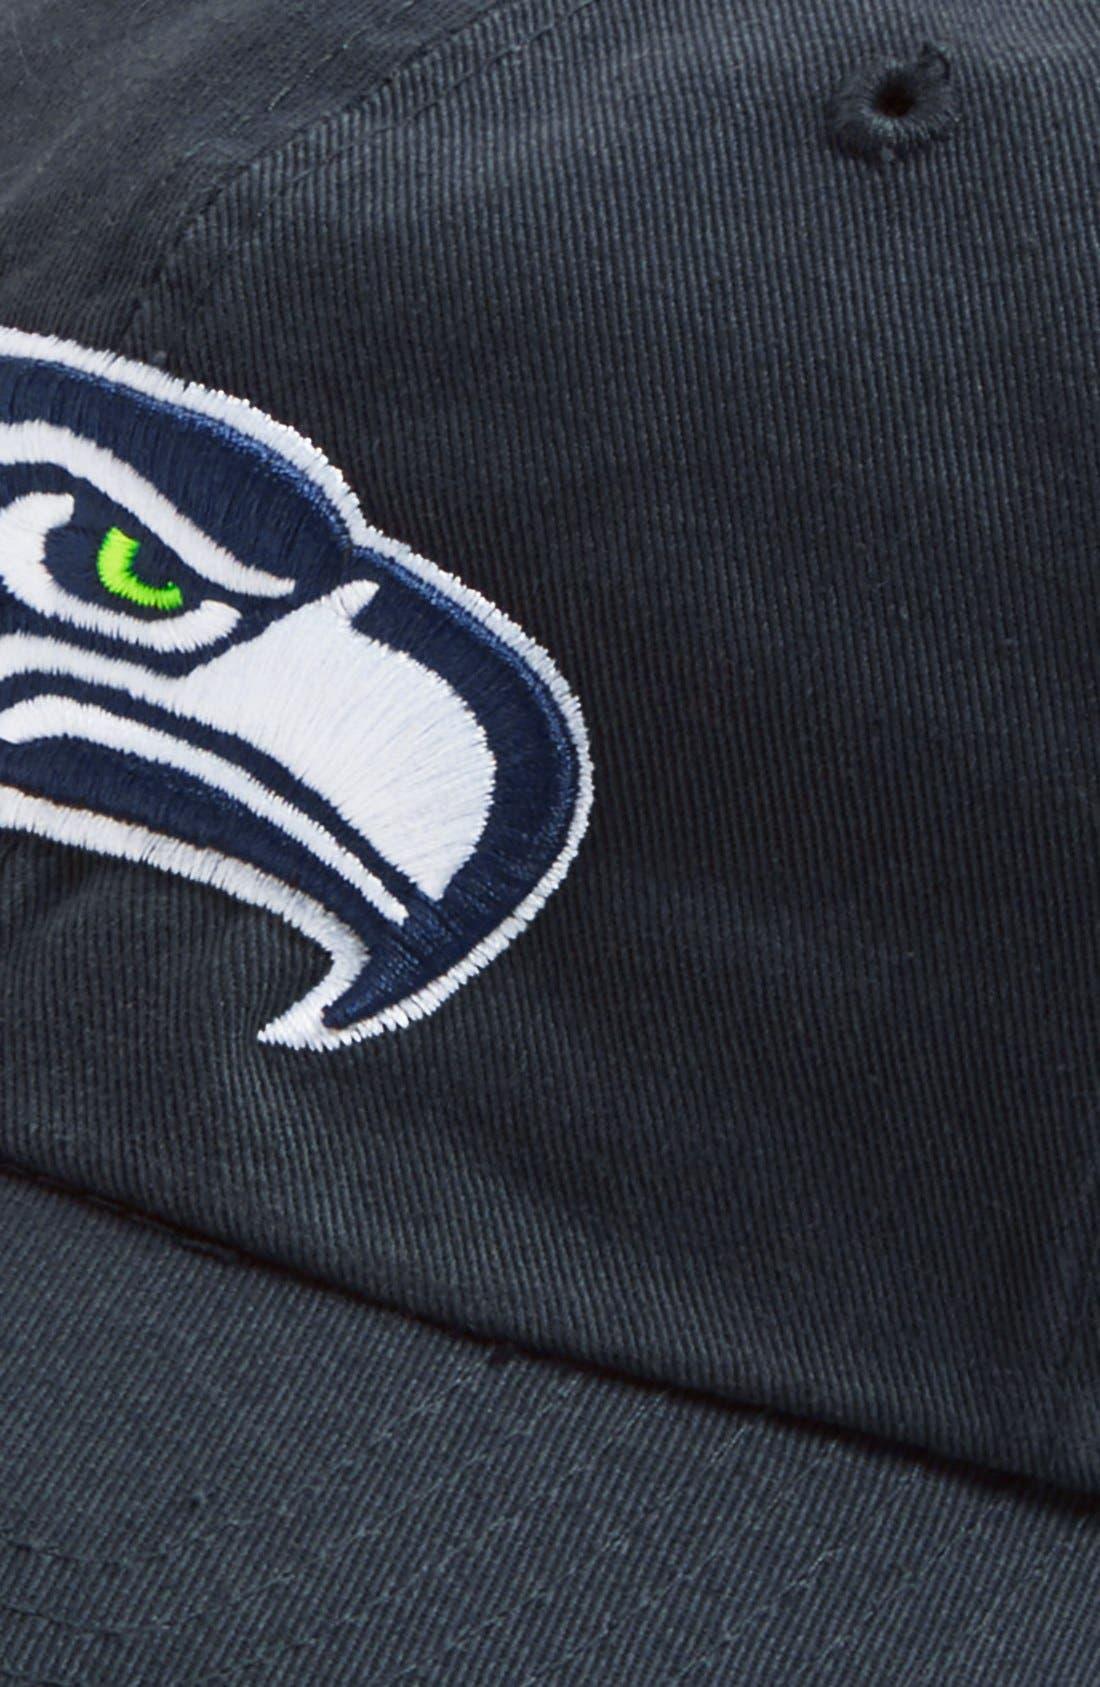 'Seattle Seahawks - Clean Up' Cap,                             Alternate thumbnail 2, color,                             410